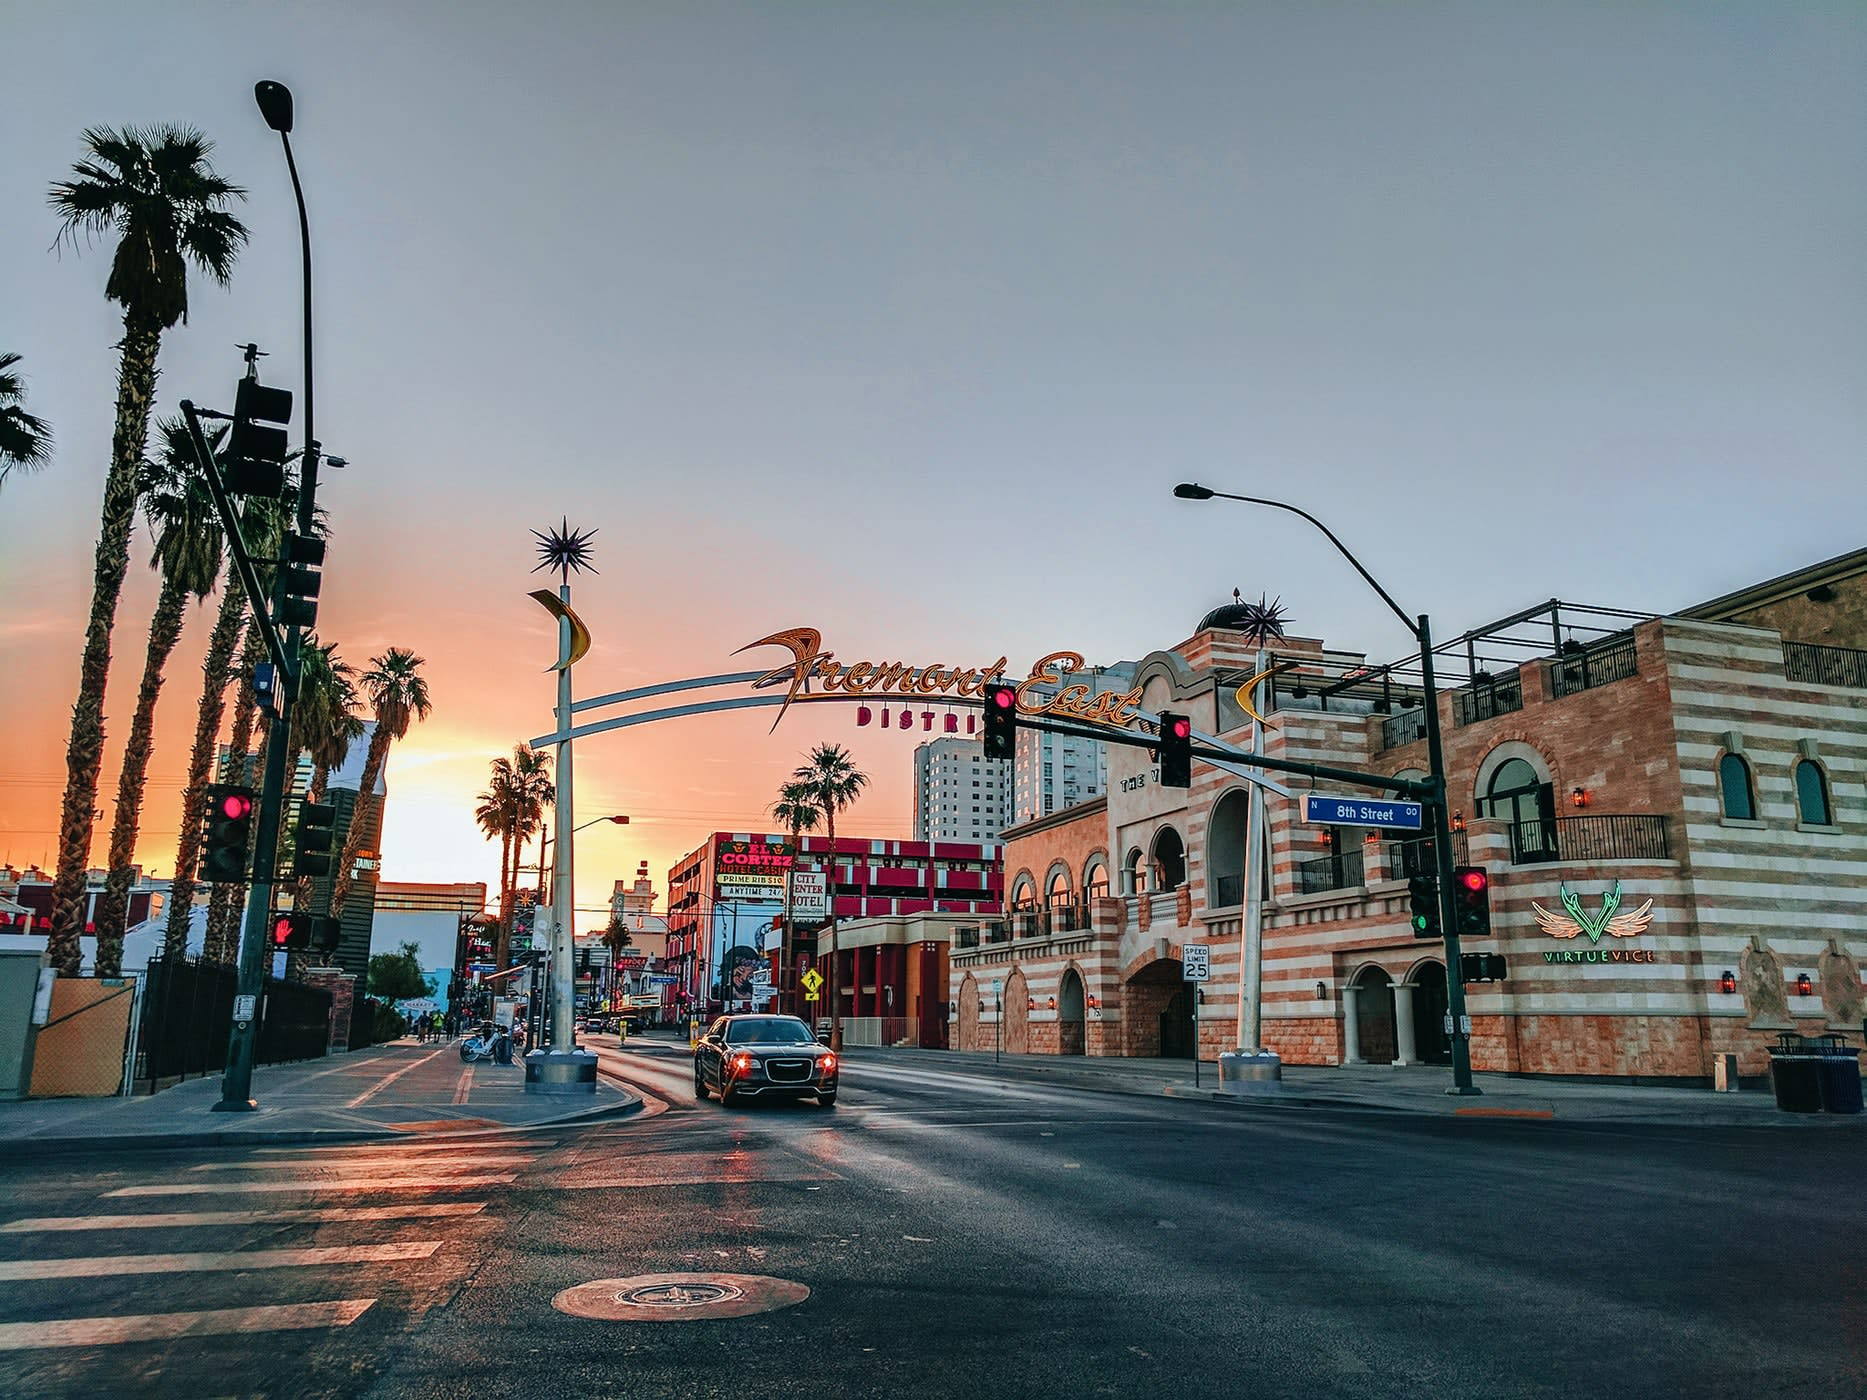 Greentube dodaje Cops 'n' Robbers Vegas Nights do swojego stylu w Las Vegas